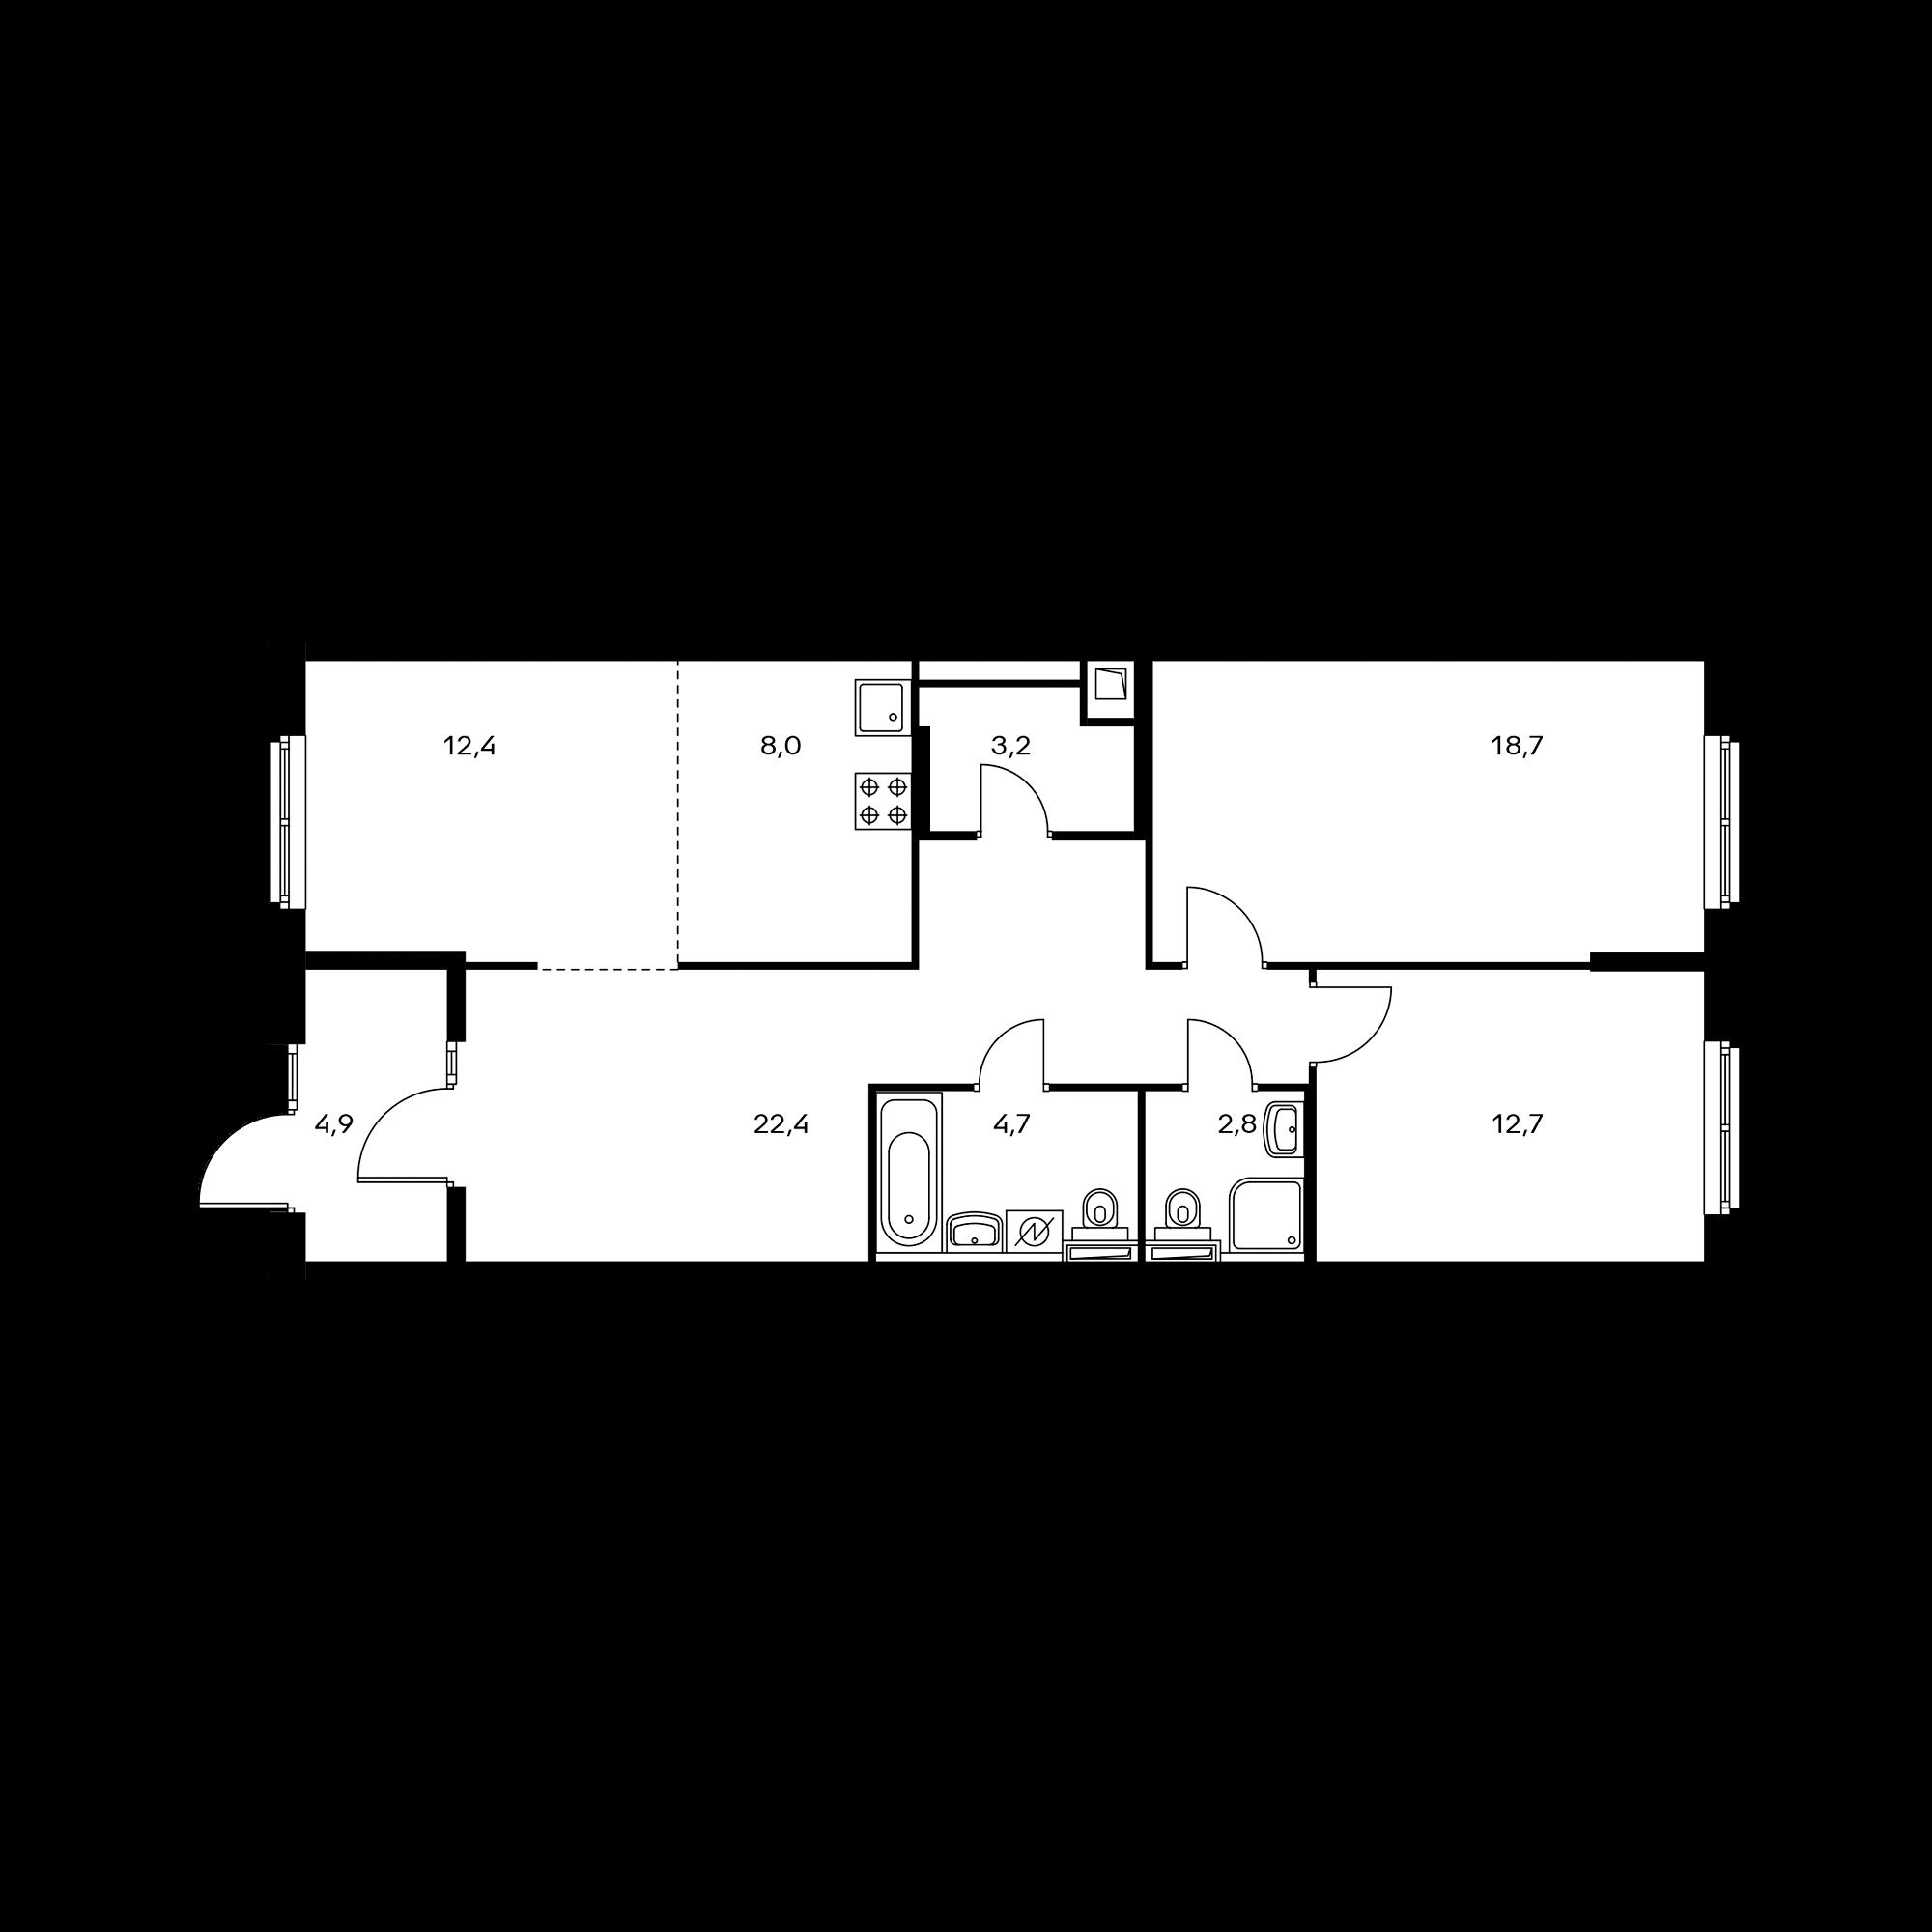 3NL1_6.6_1Э